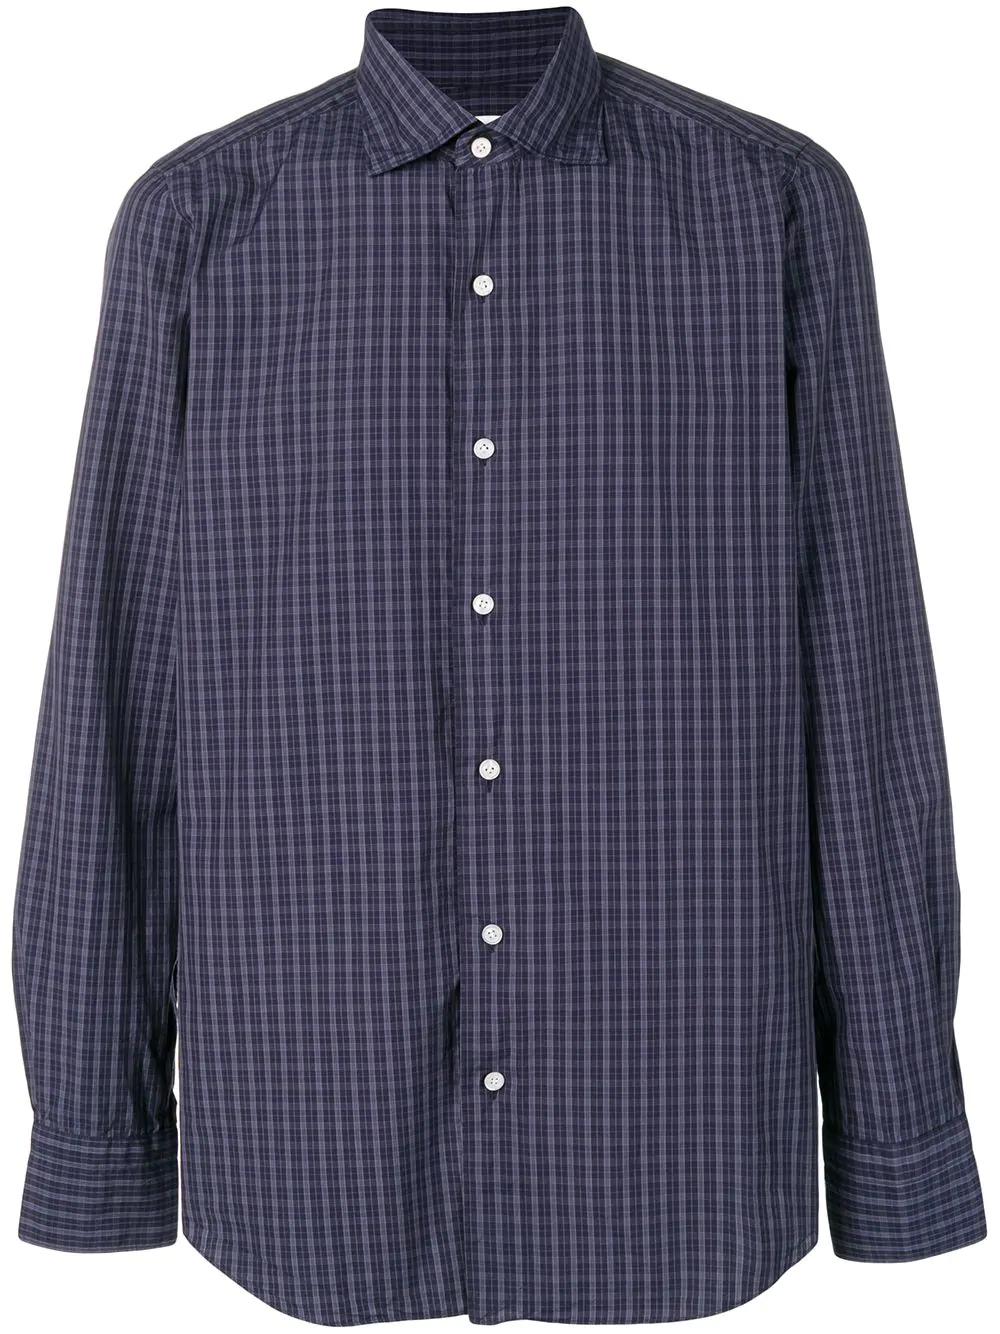 2d0599f1a95 Finamore 1925 Napoli Tokyo Checked Shirt - Blue. Farfetch